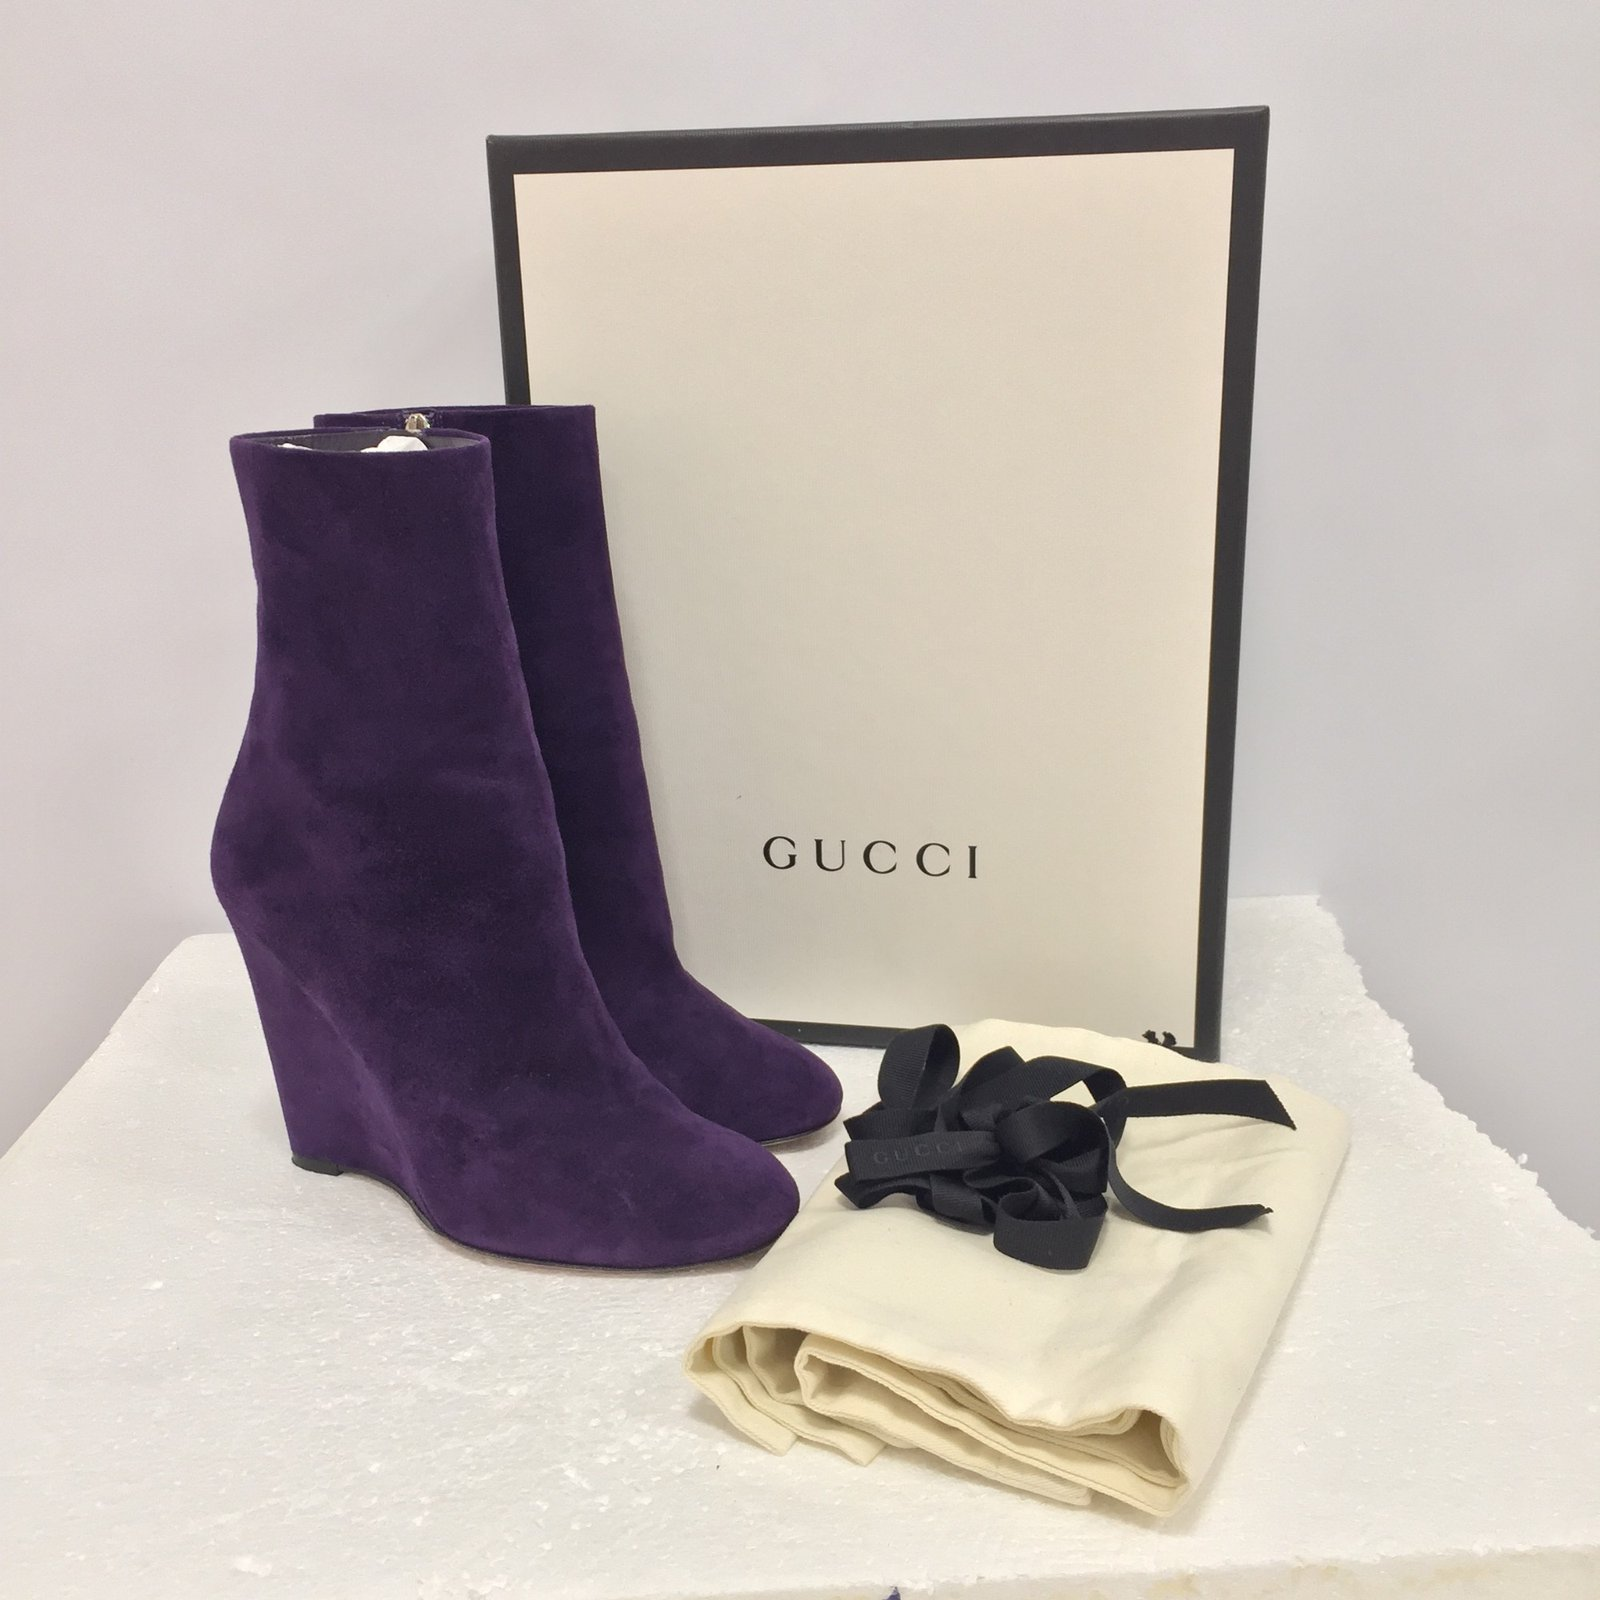 677936f6cc2c Gucci Ankle Boots Ankle Boots Suede Purple ref.84166 - Joli Closet